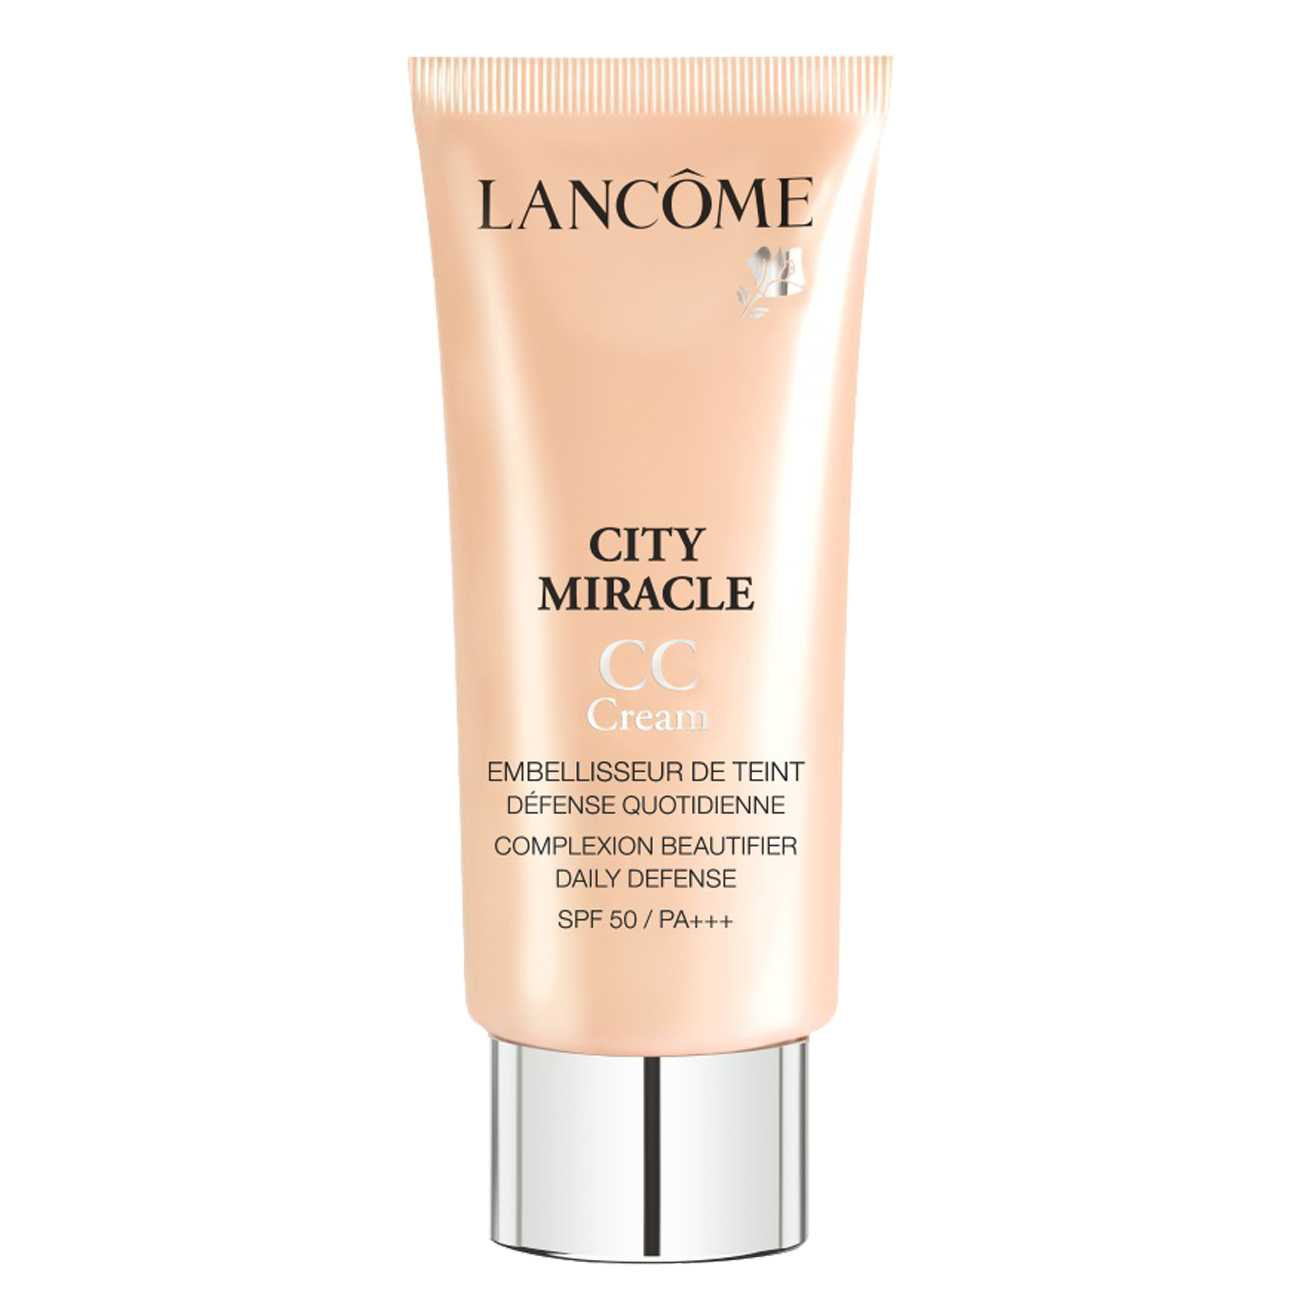 City Miracle Cc Cream 30 Ml Golden 3 Lancôme imagine 2021 bestvalue.eu